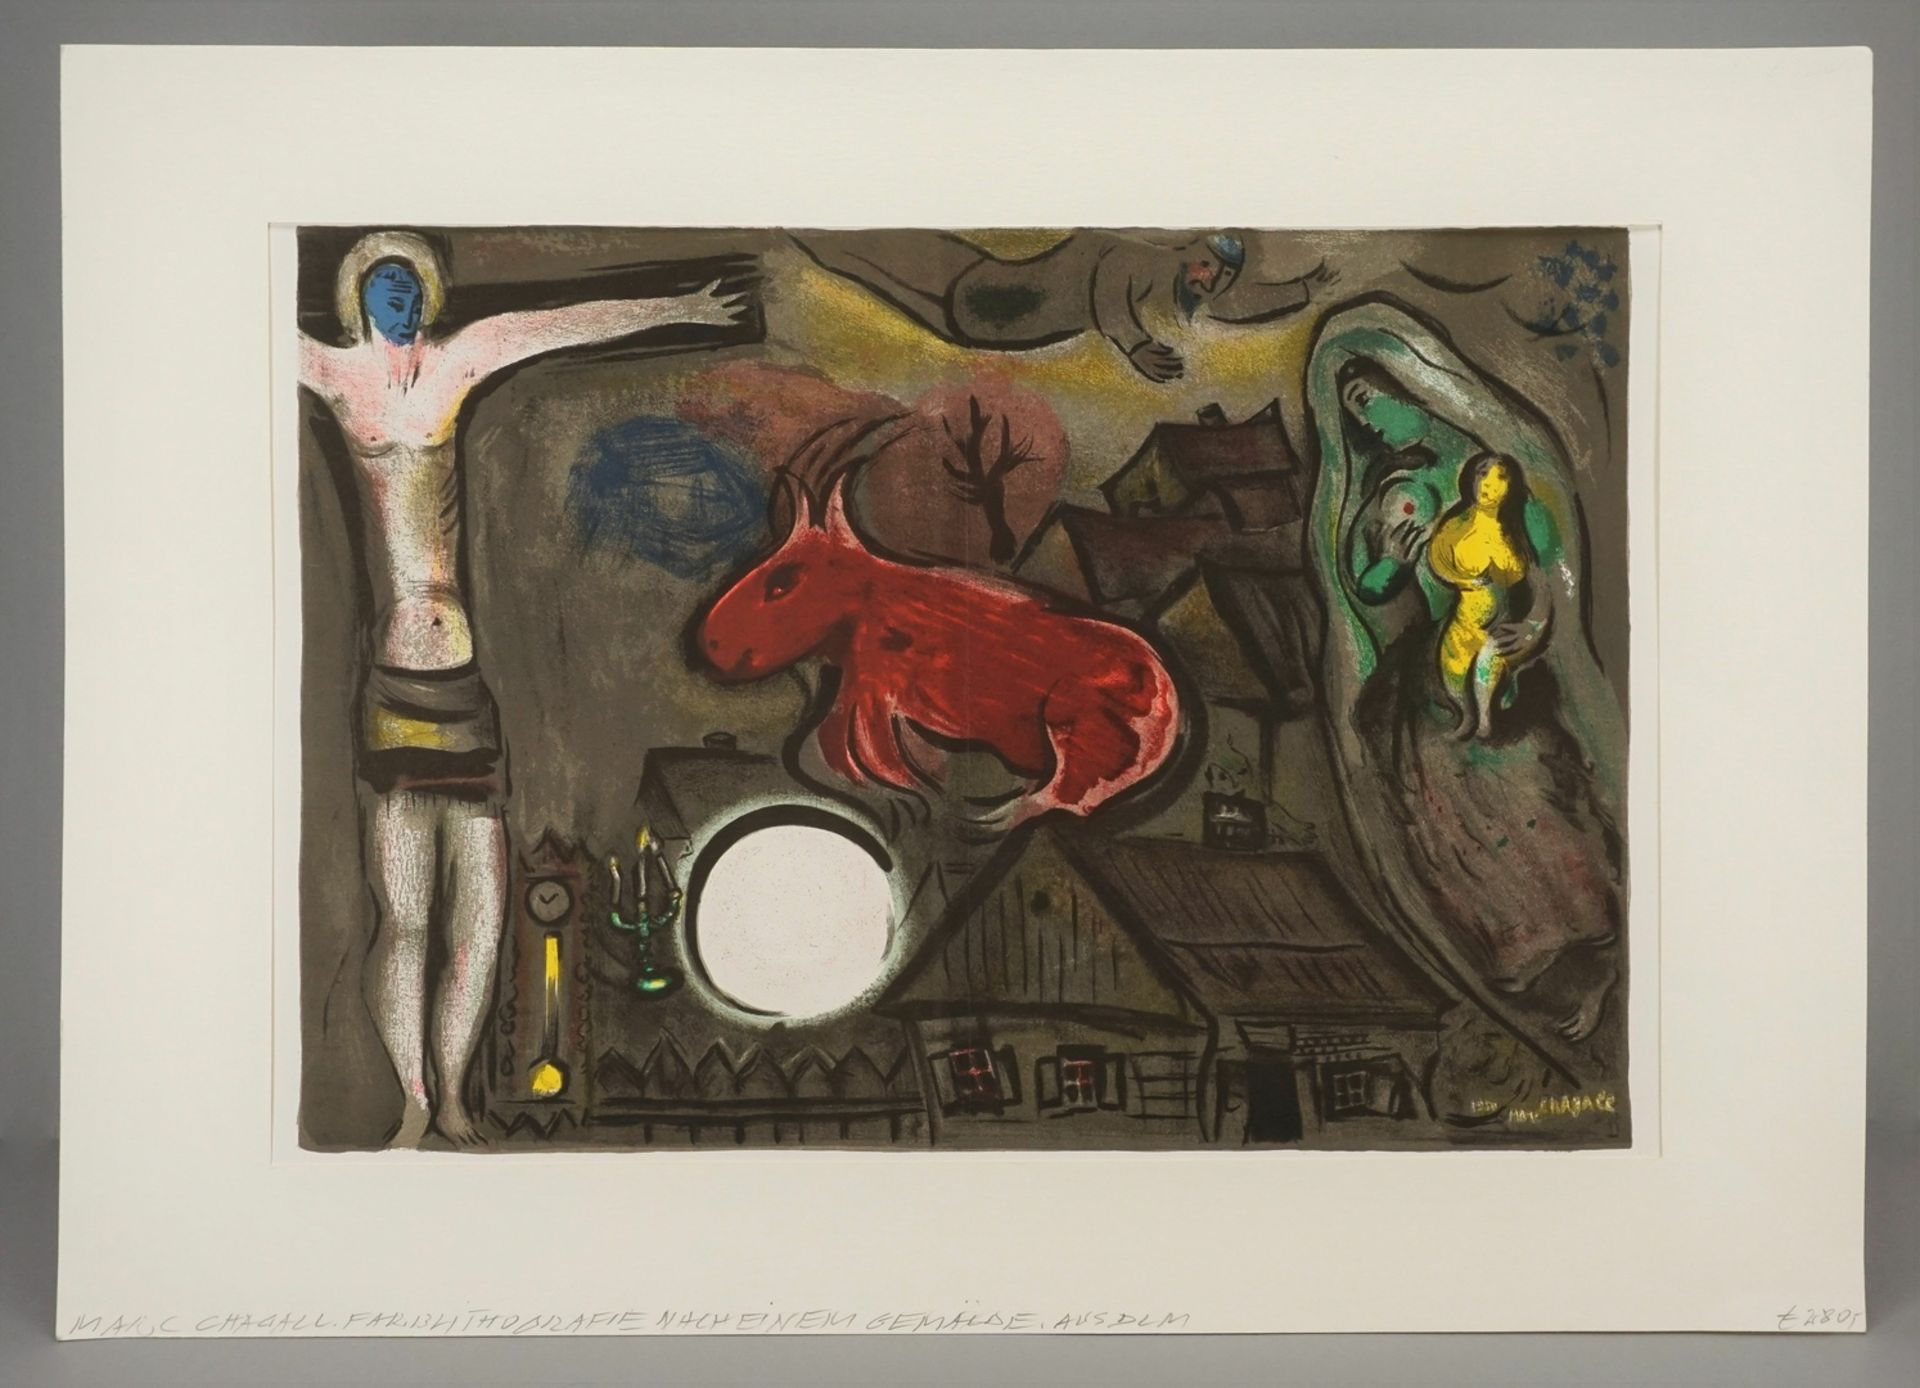 Marc Chagall, Vision mit roter Kuh - Bild 2 aus 5